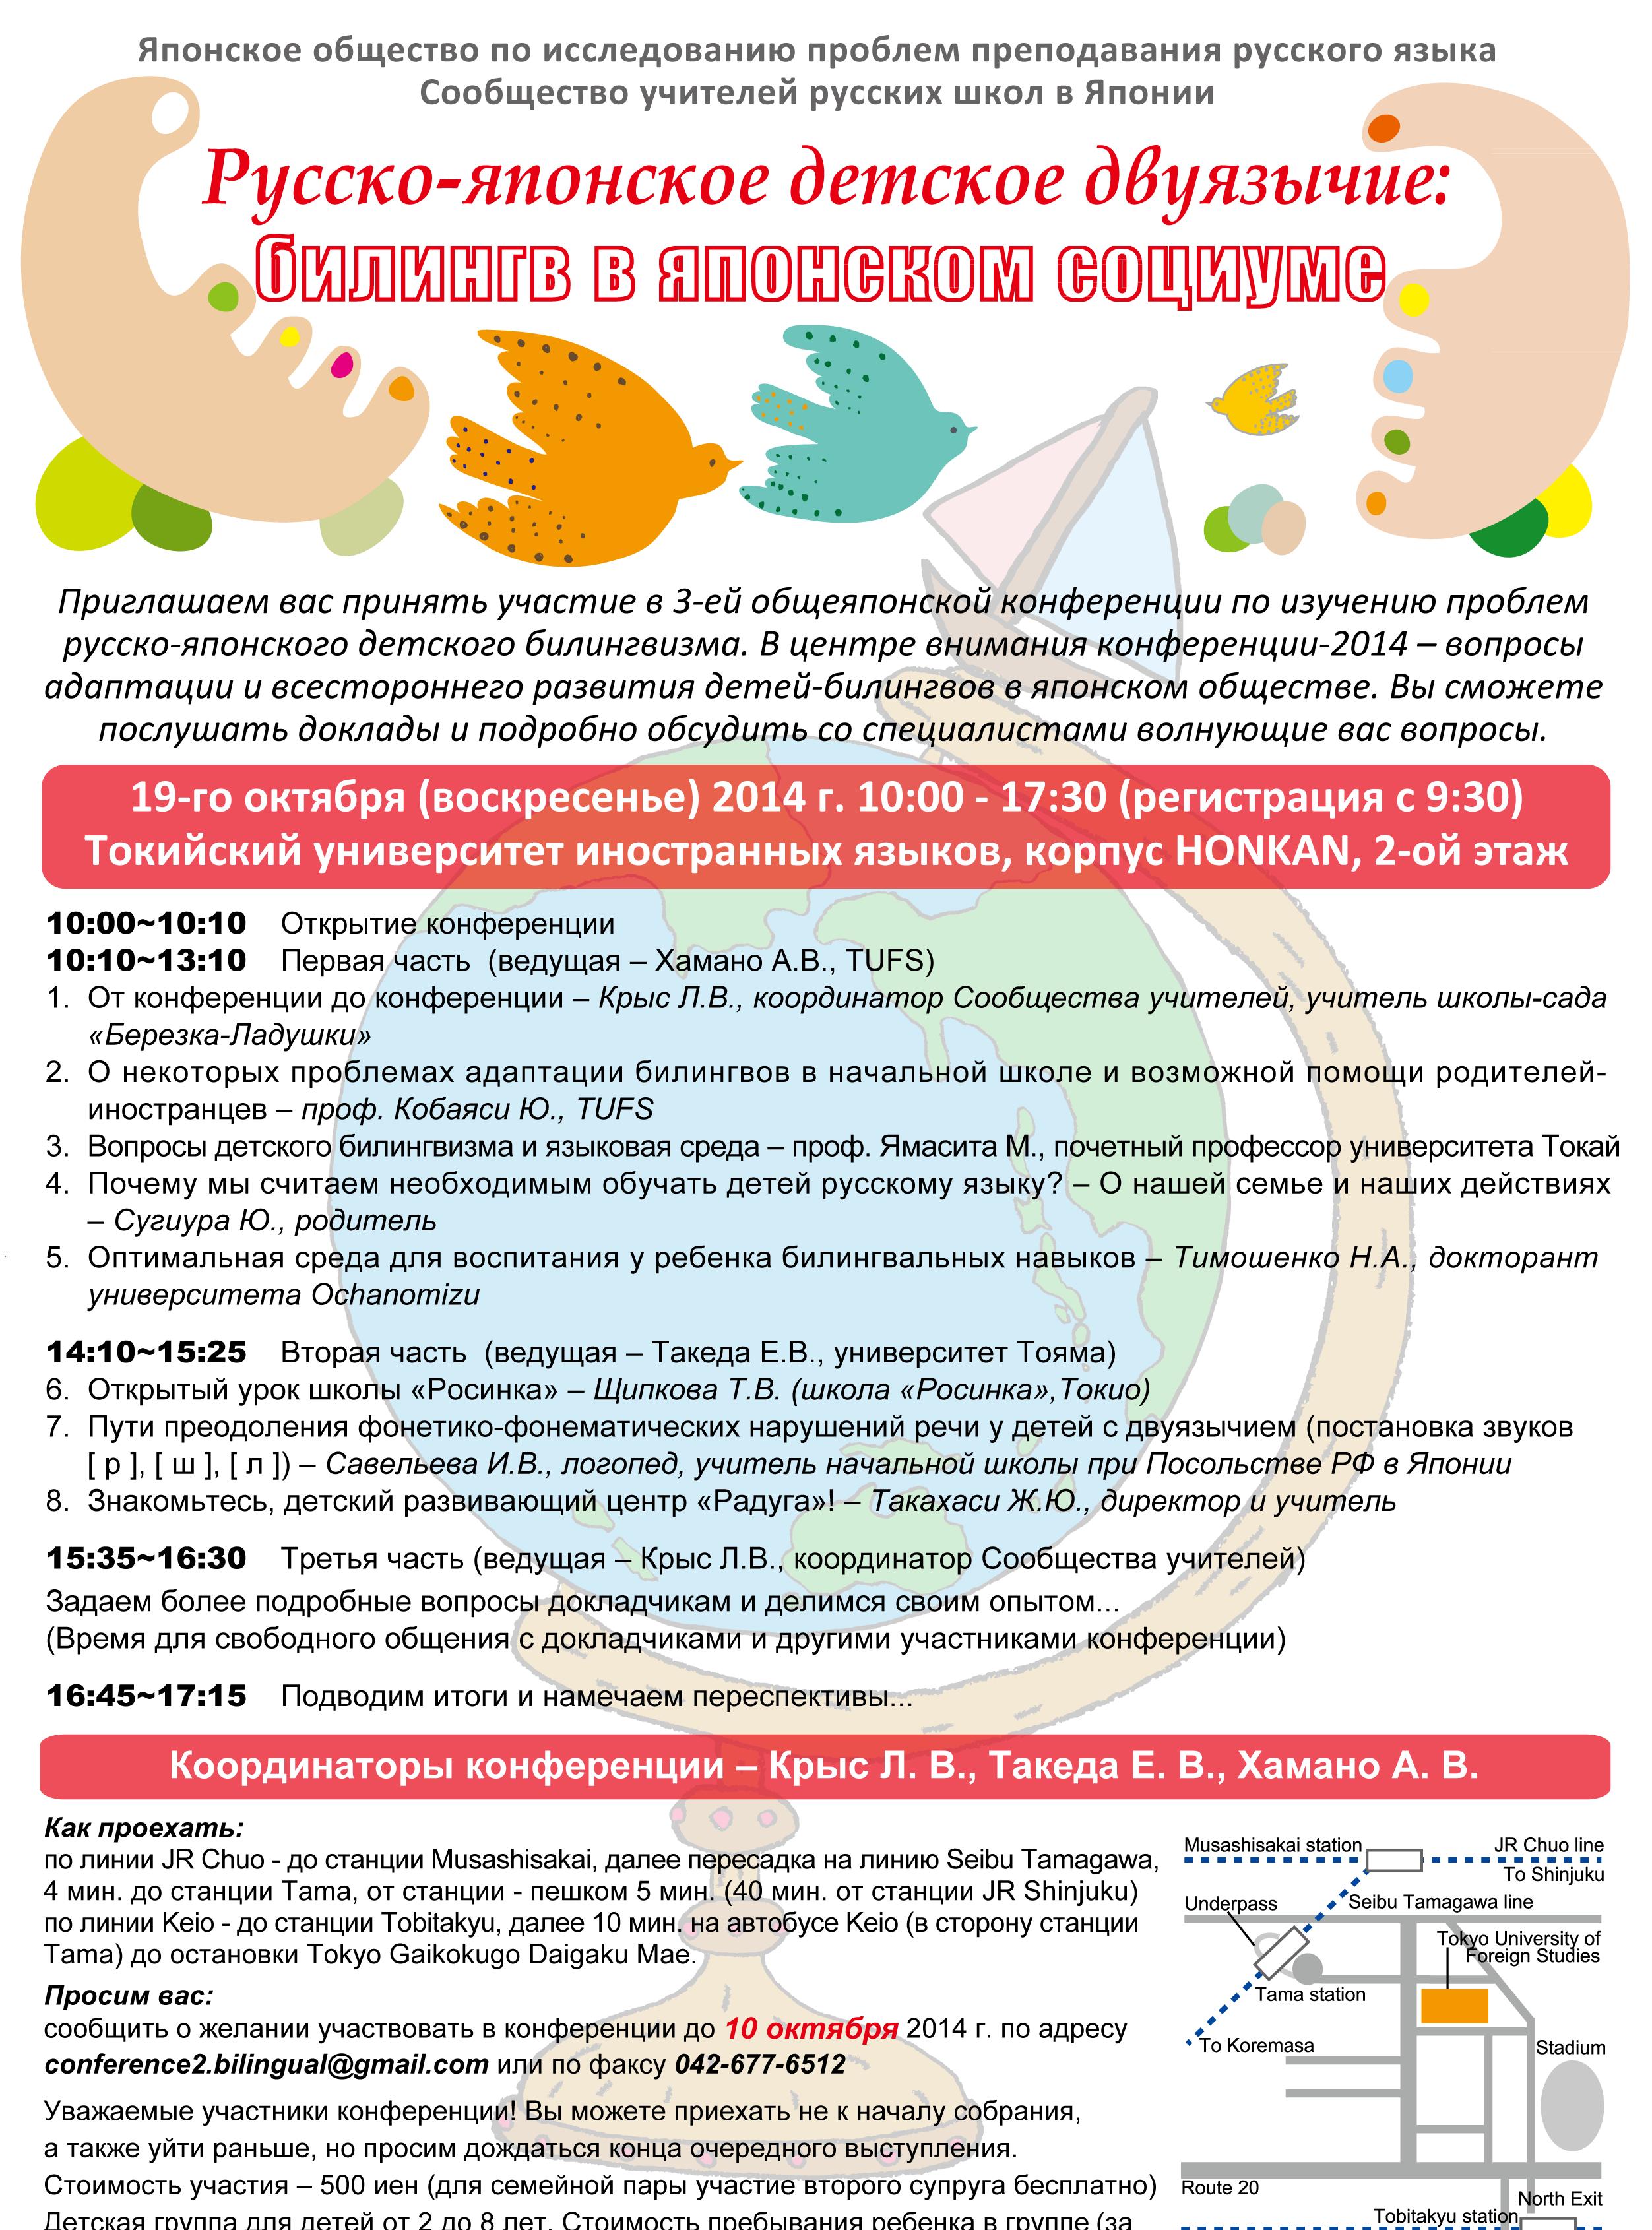 AFISHA2014RUS-2入稿用